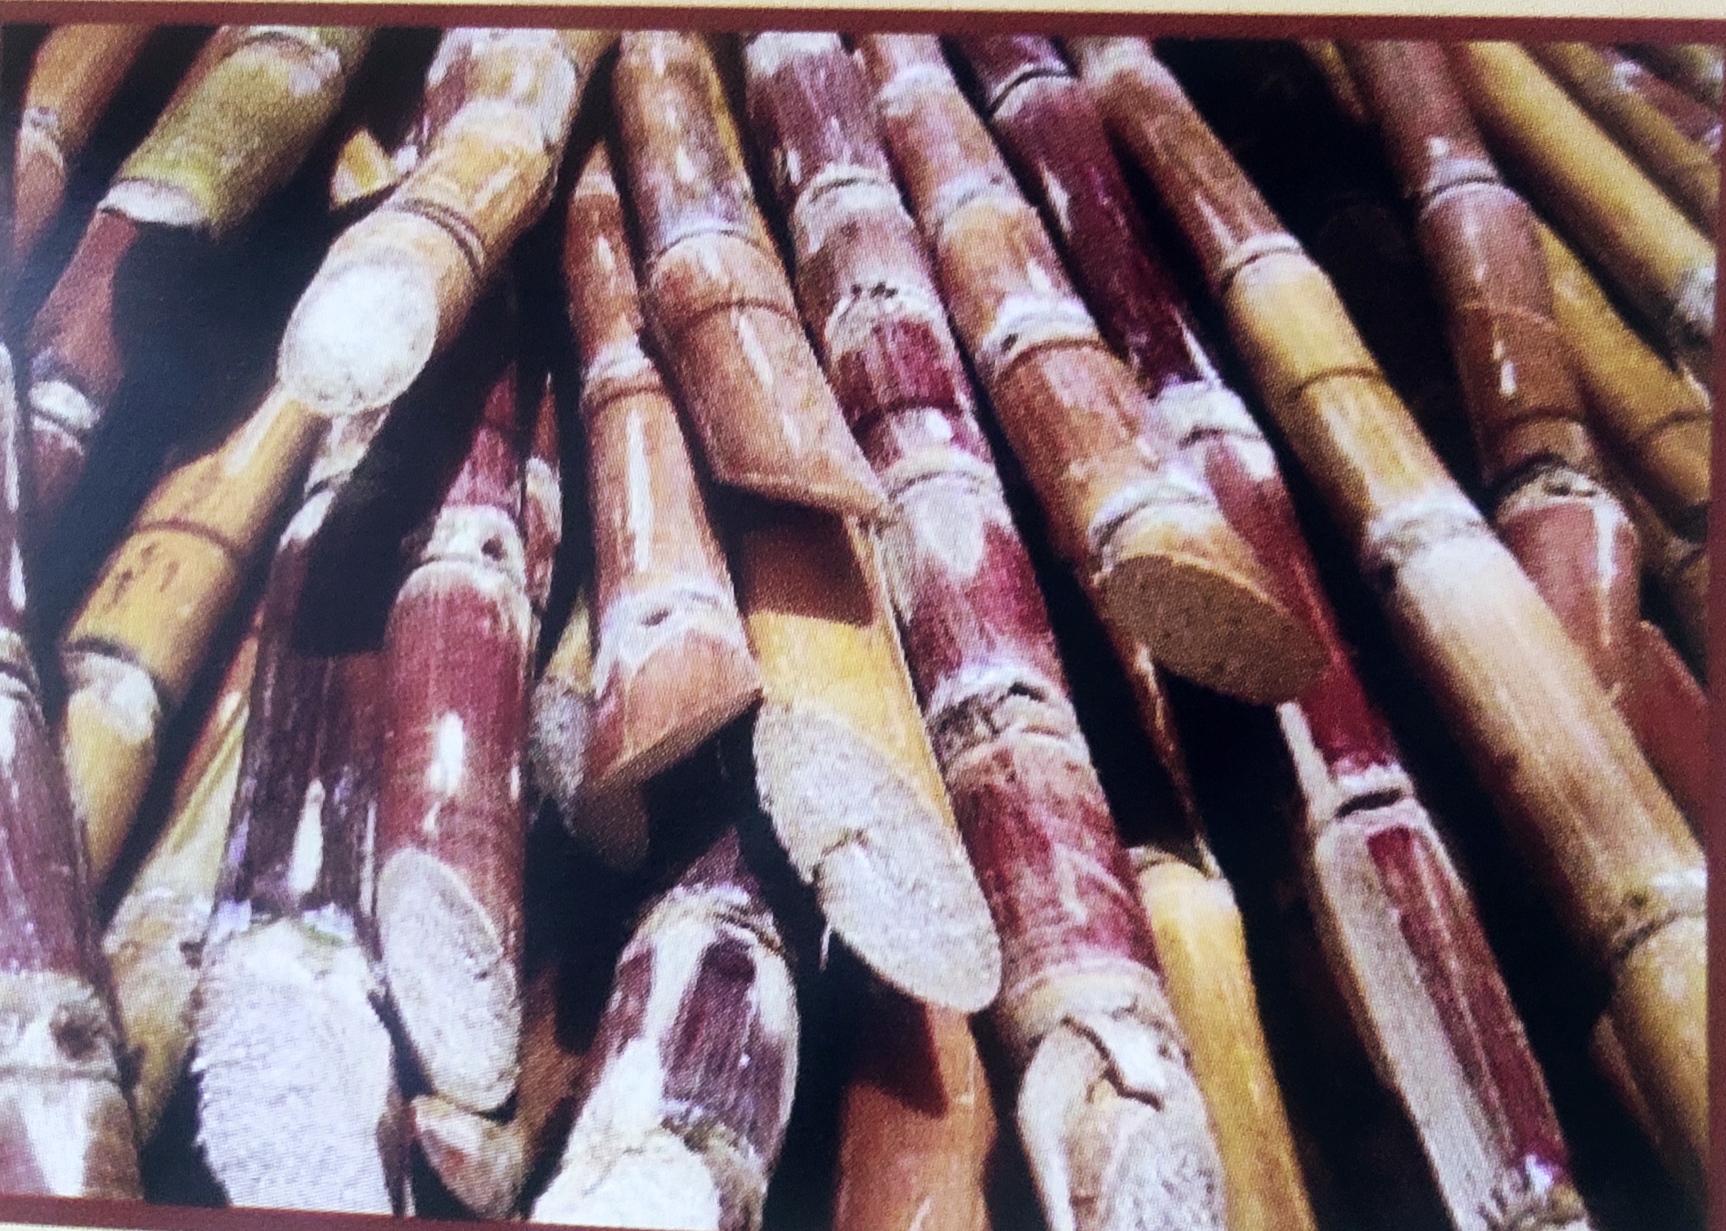 Image contains sugar cane